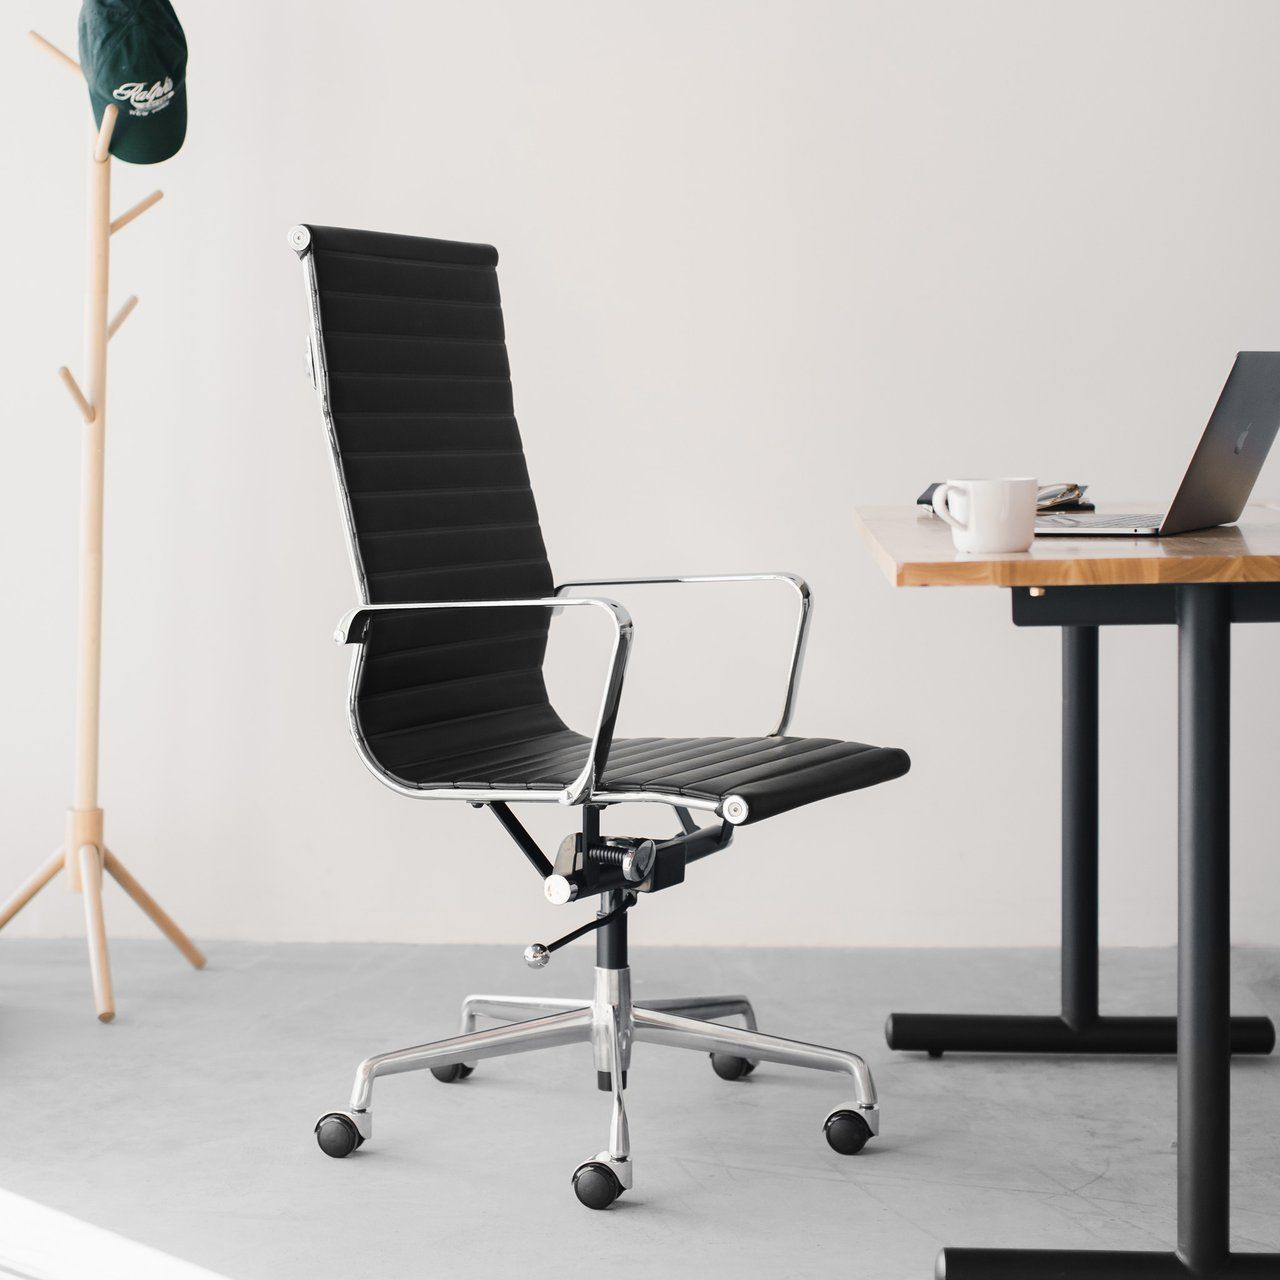 Pin On Mid Century Modern Office Chairs